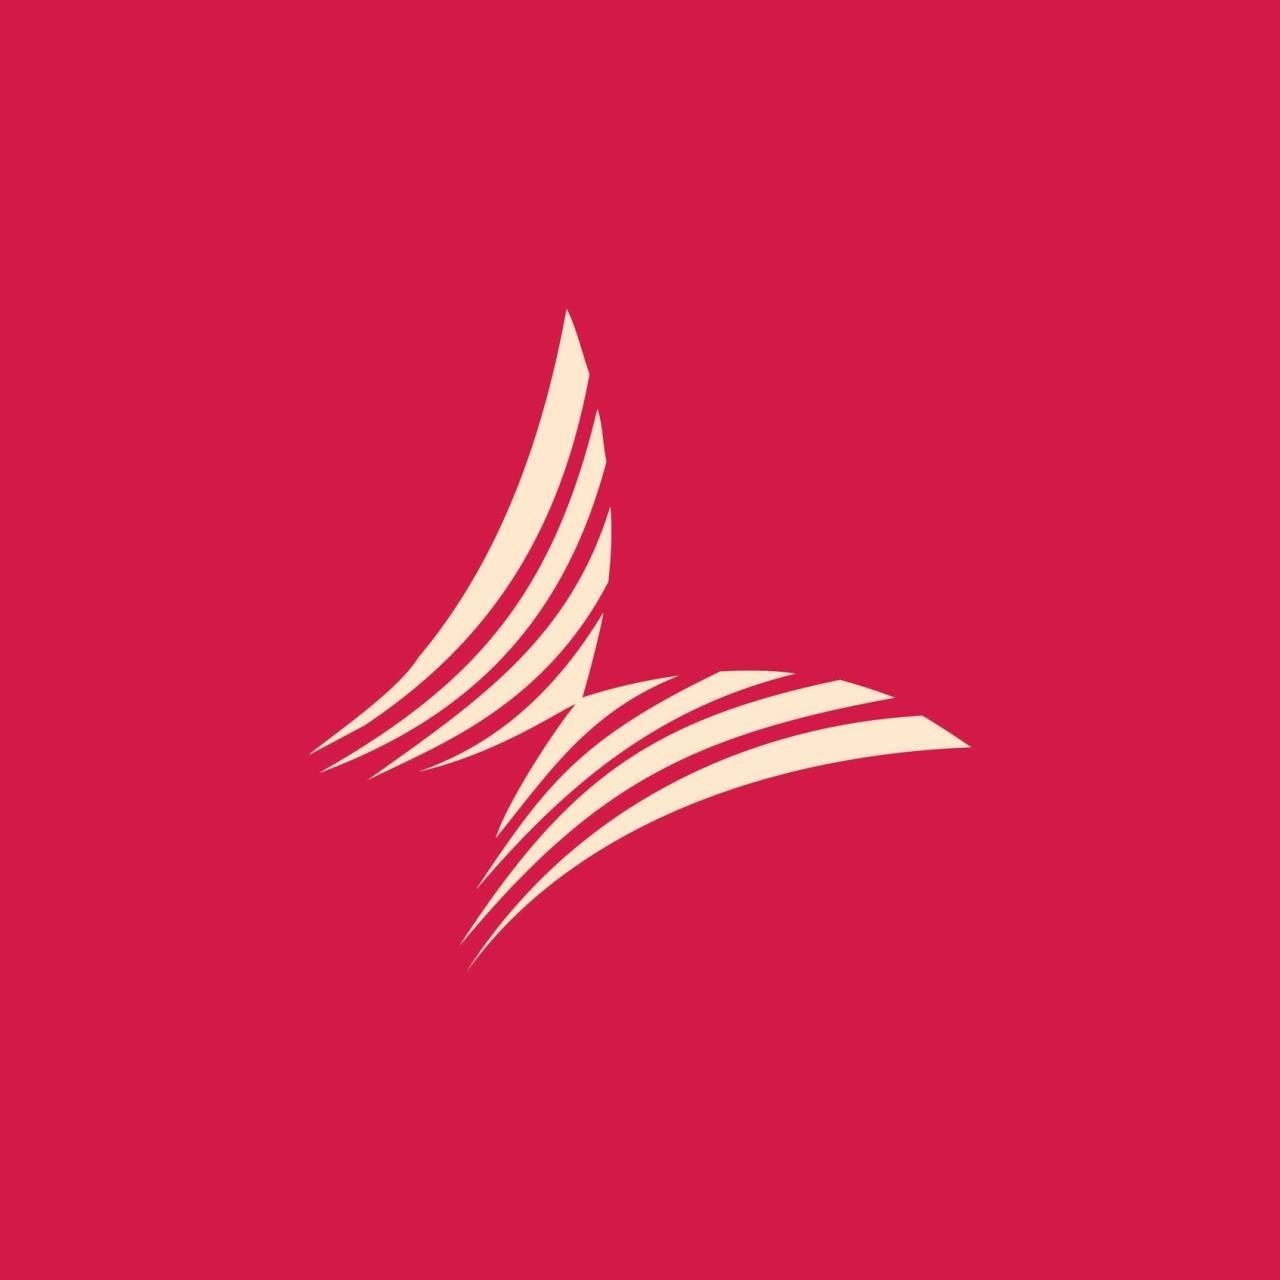 Кафе Butterfly (Баттерфляй), Печора - логотип